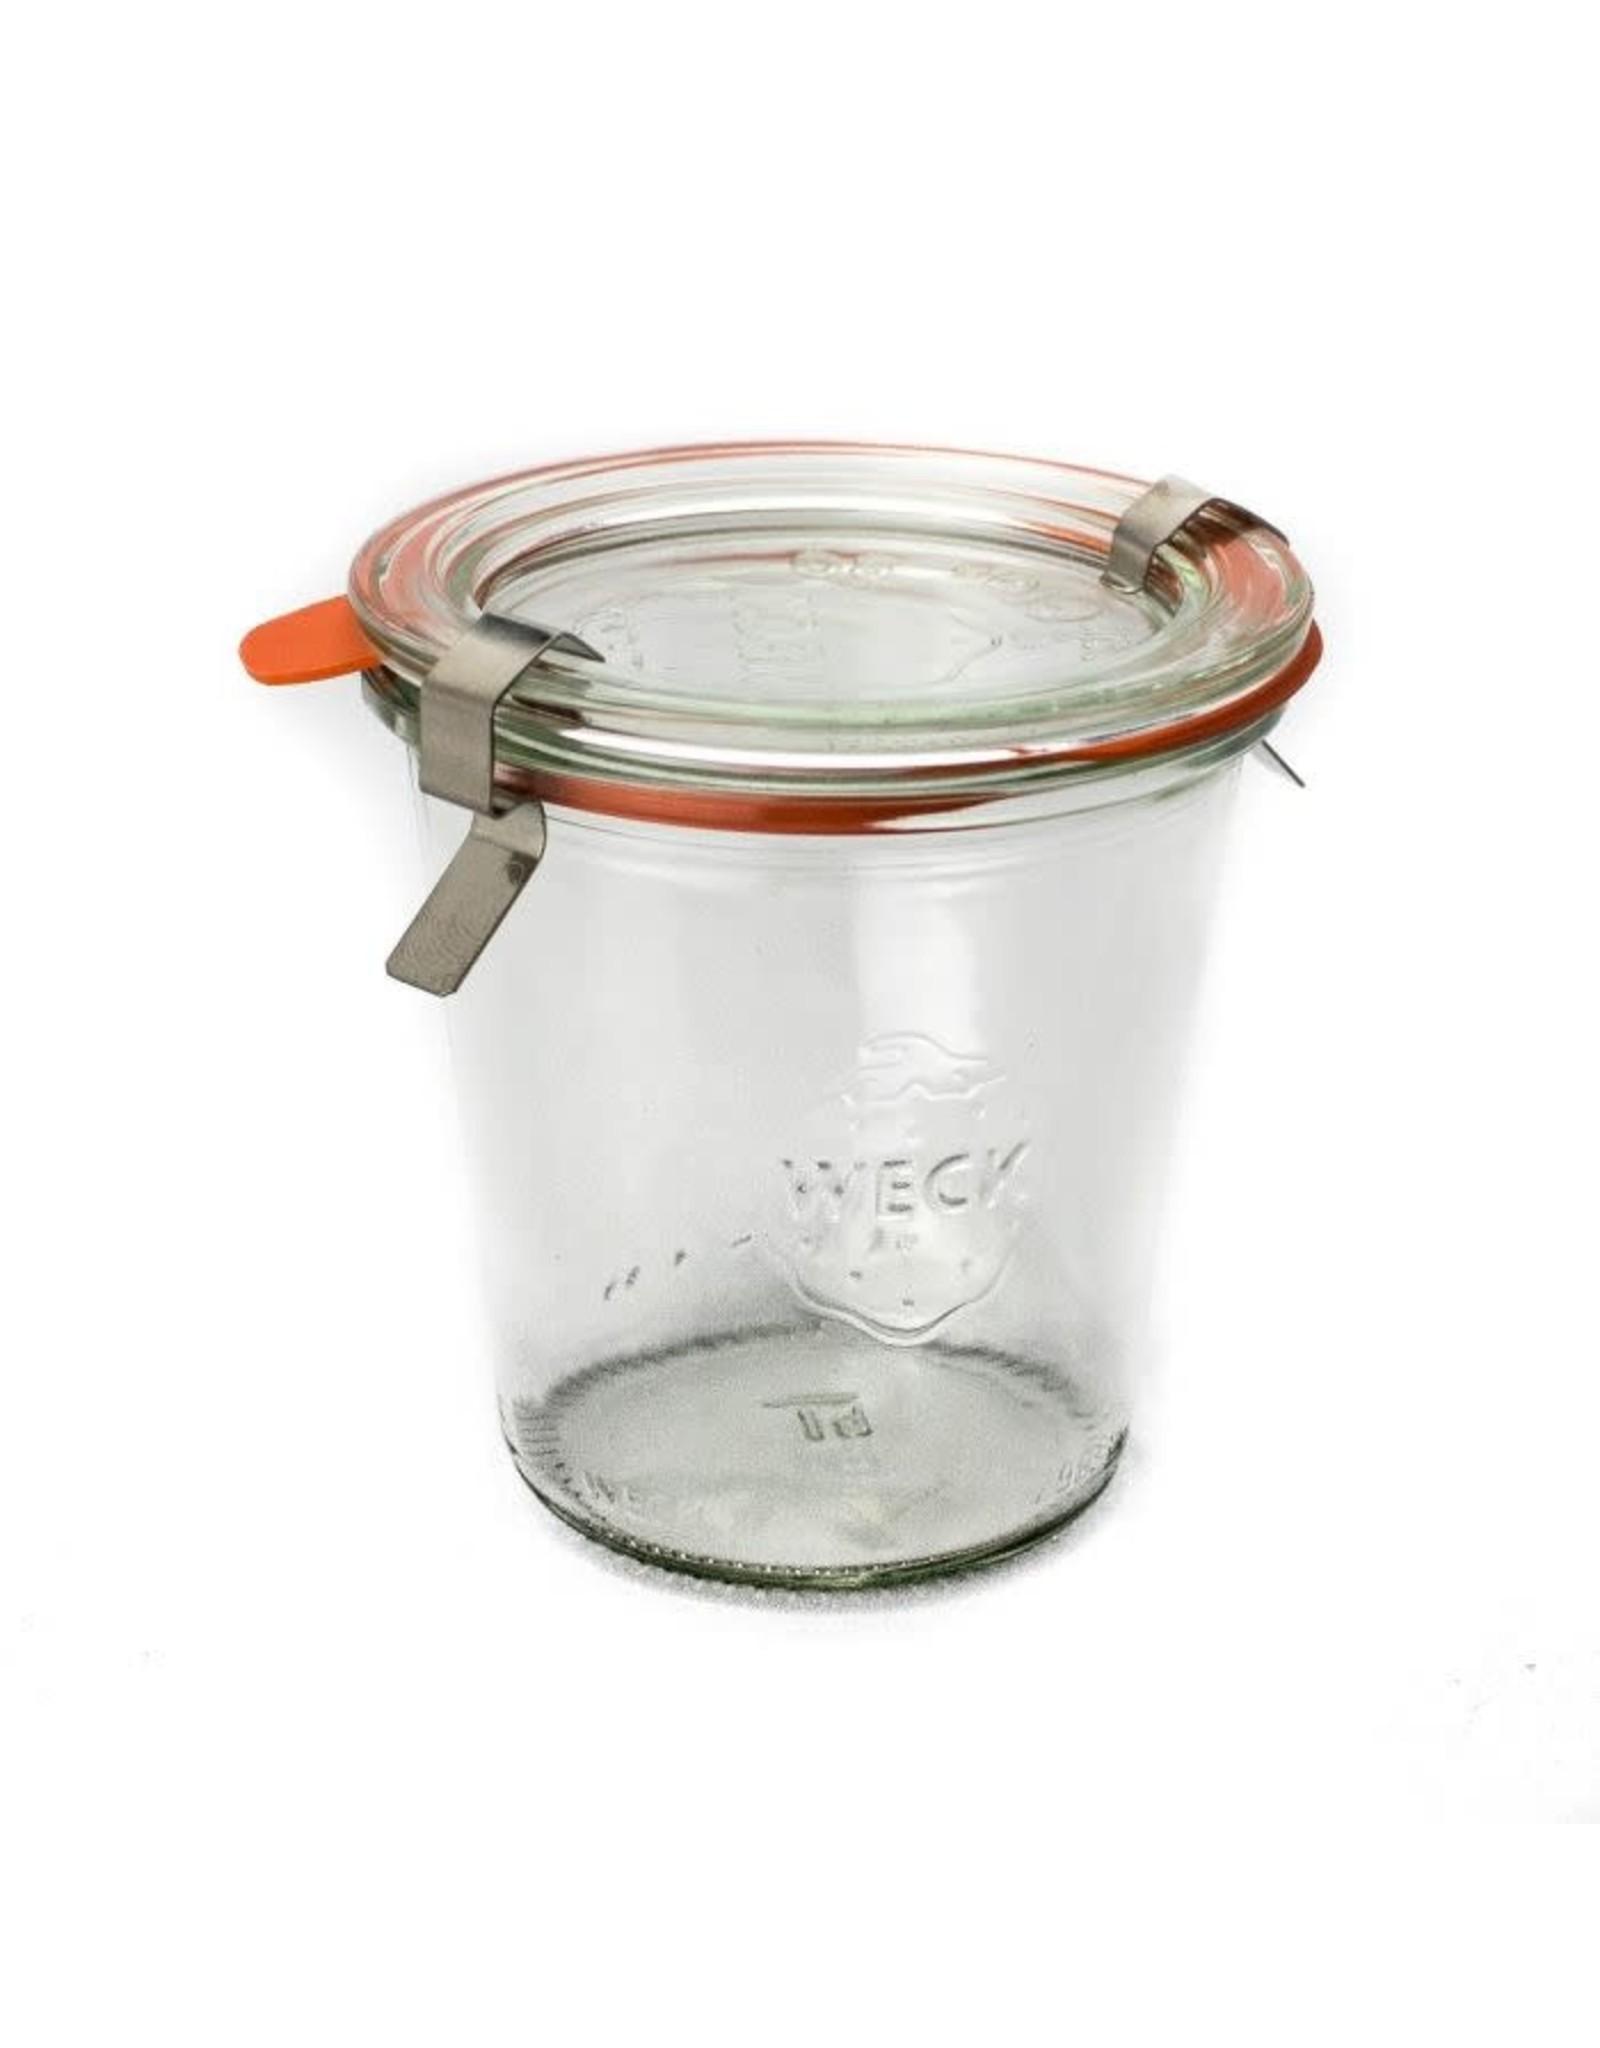 Weck Weck Glass Jar, Mold '900' 1/5 L